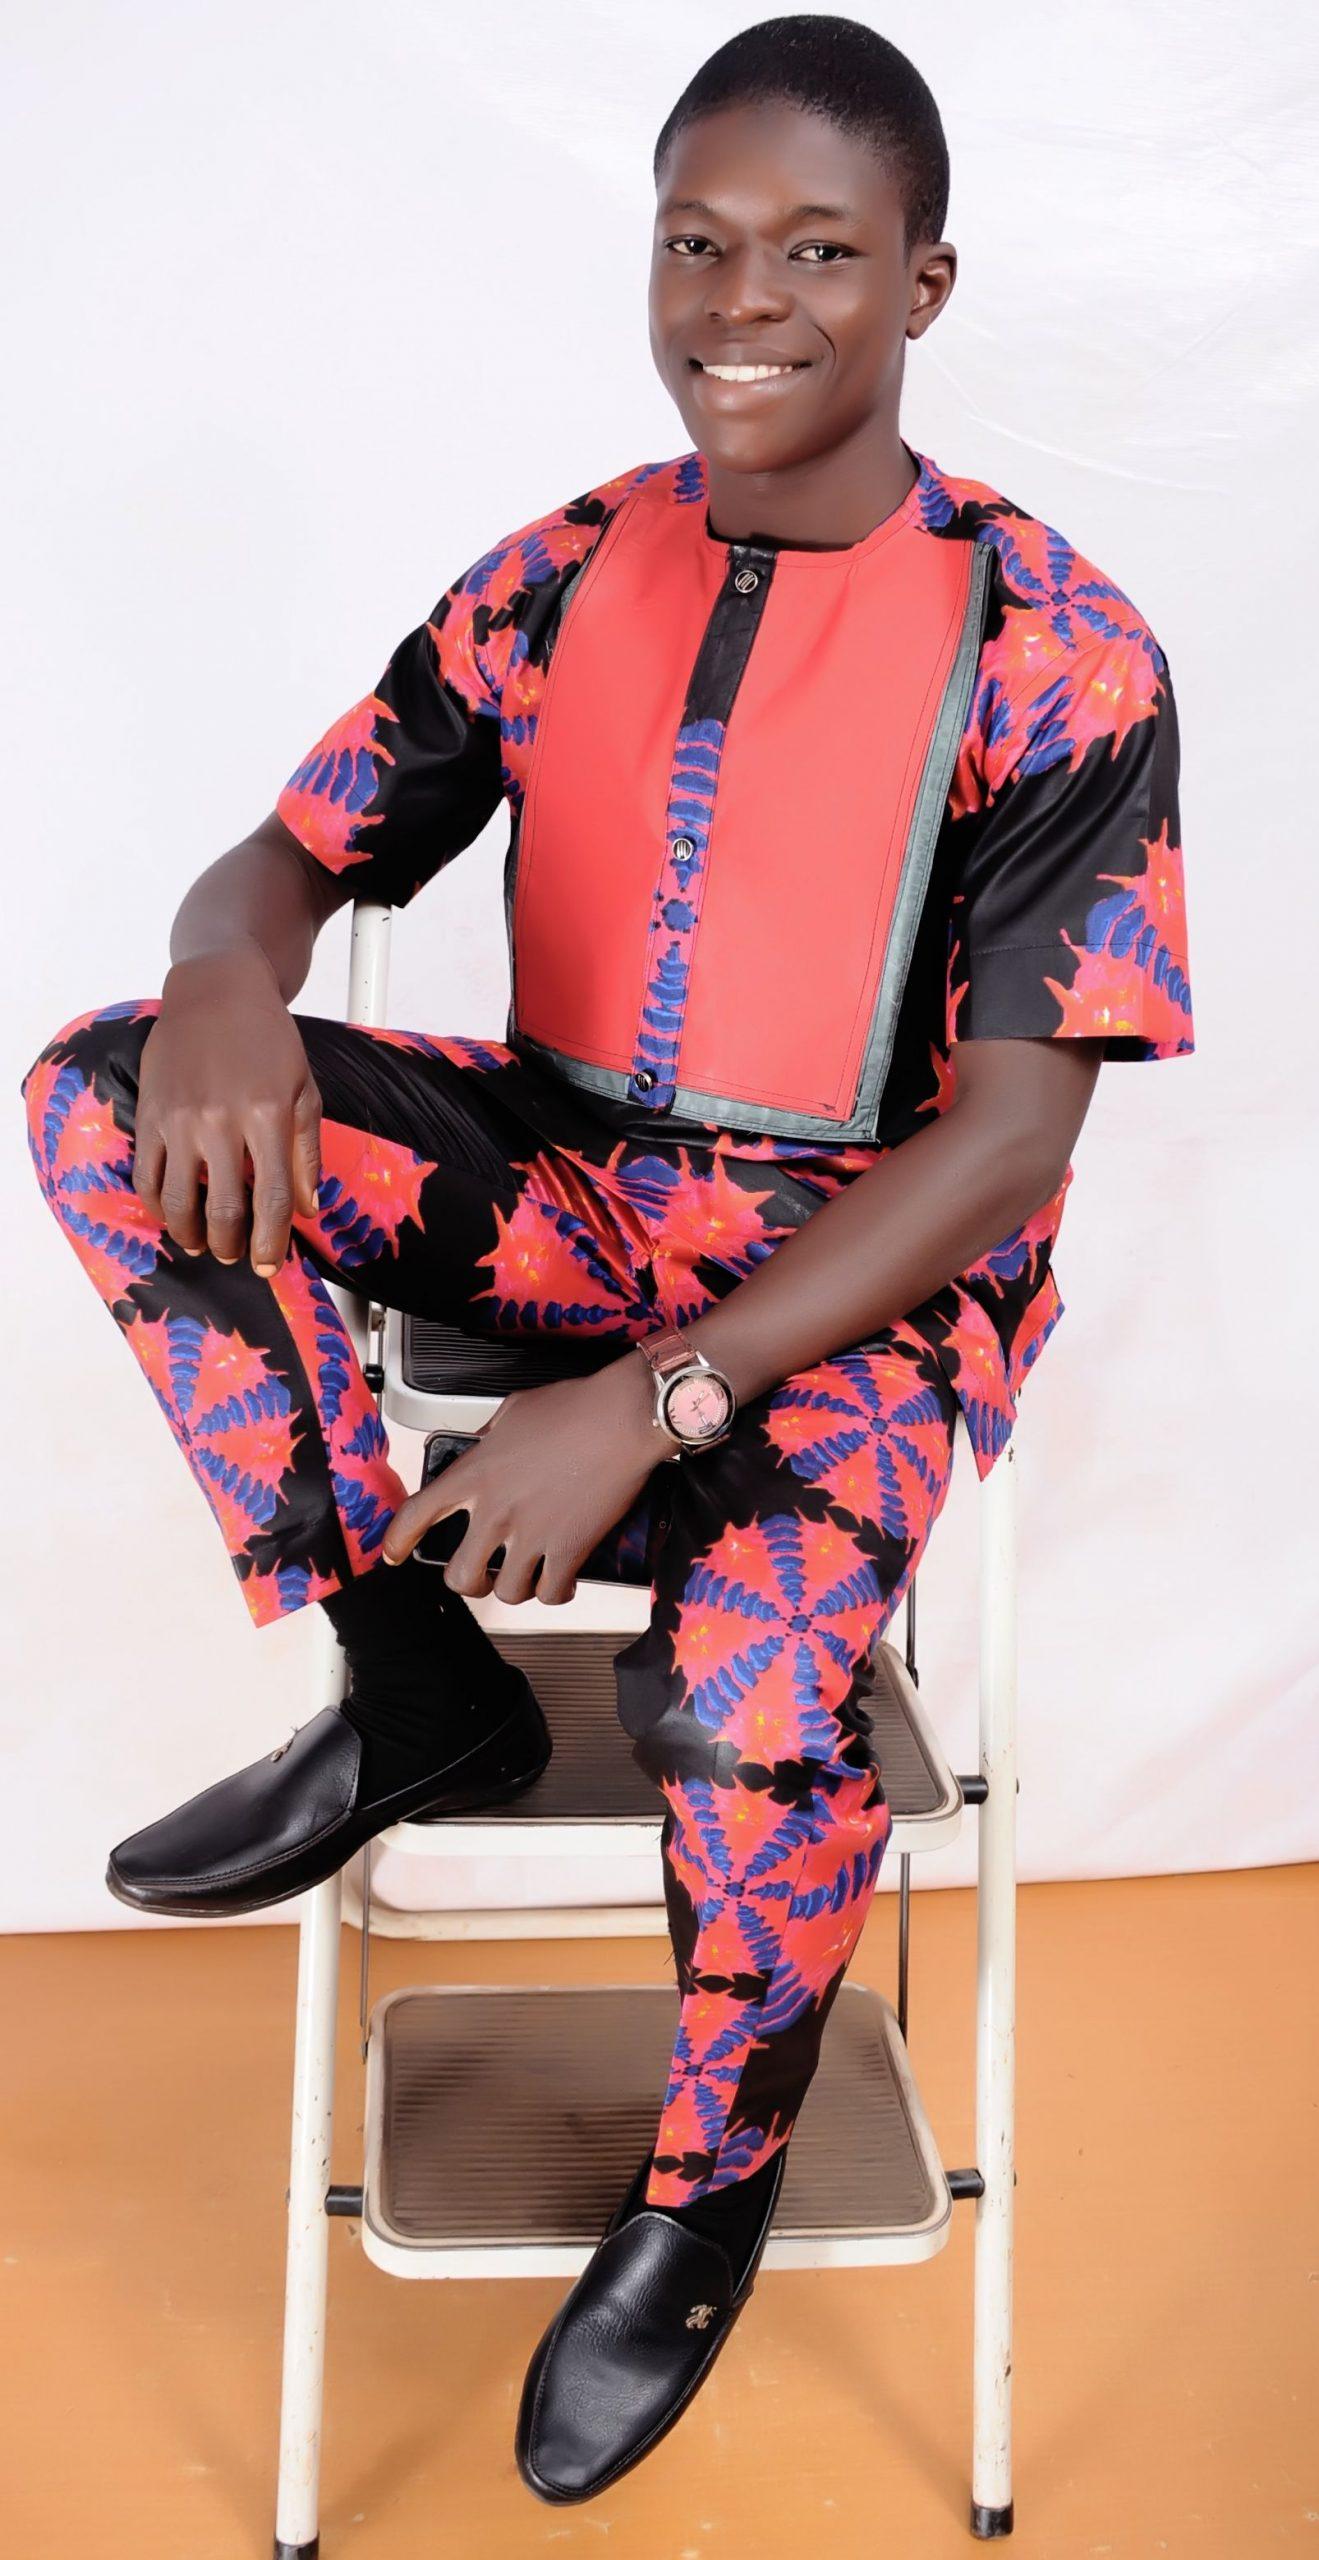 Abdulrazaq Yahaya, content editor and founder of fastknowers.com